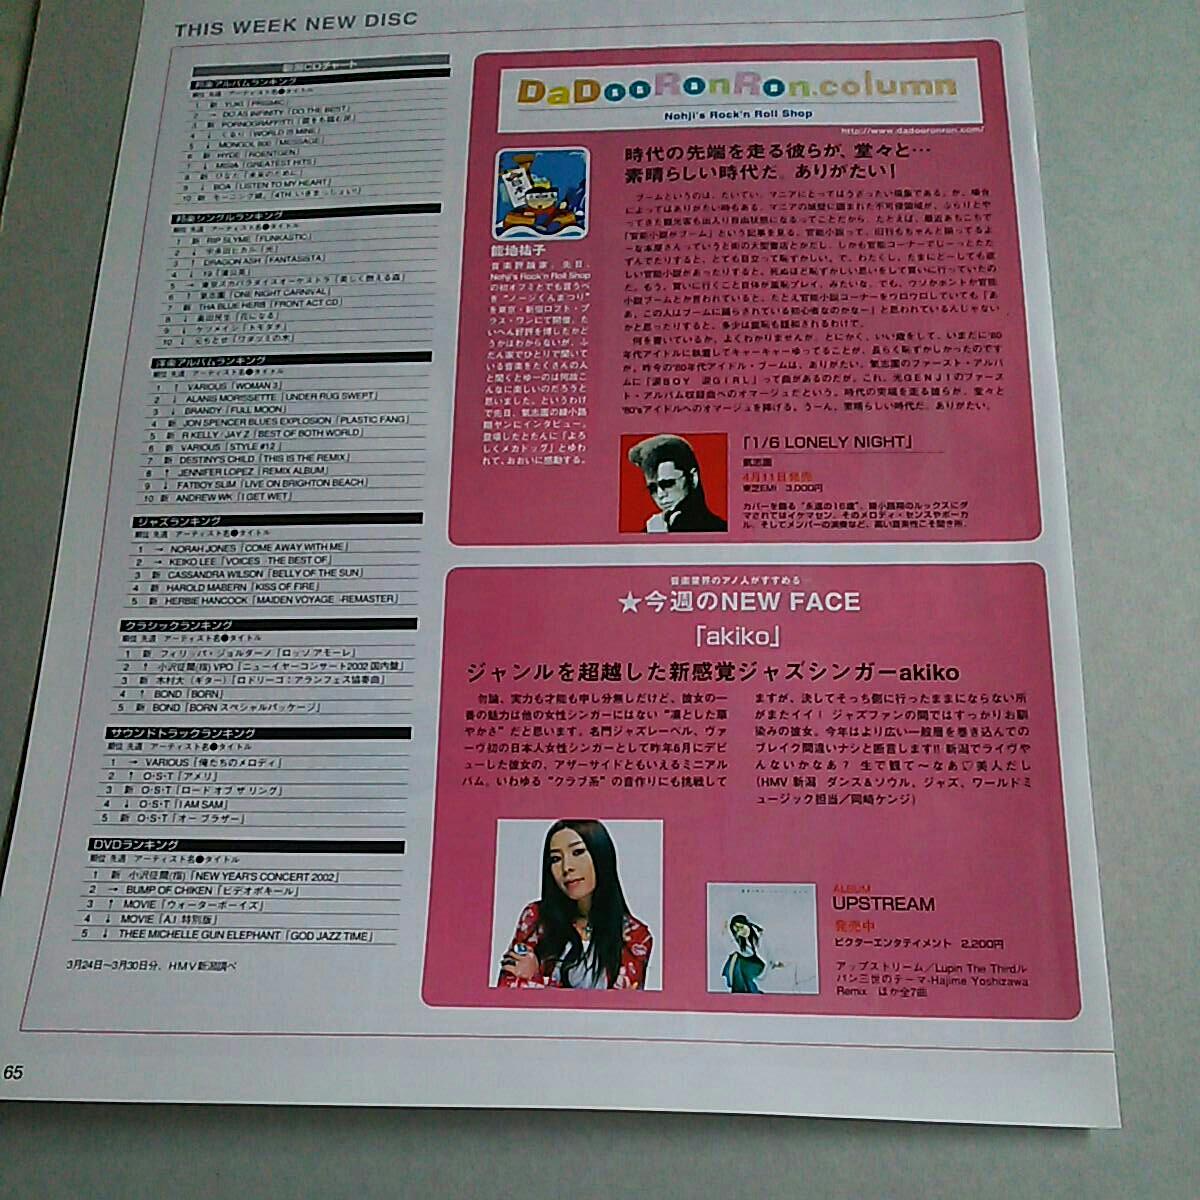 【激レア!!新潟県限定版雑誌大発掘写真記事2002~3年◆AKIKO◆切り抜き1P不世出一点物!!】